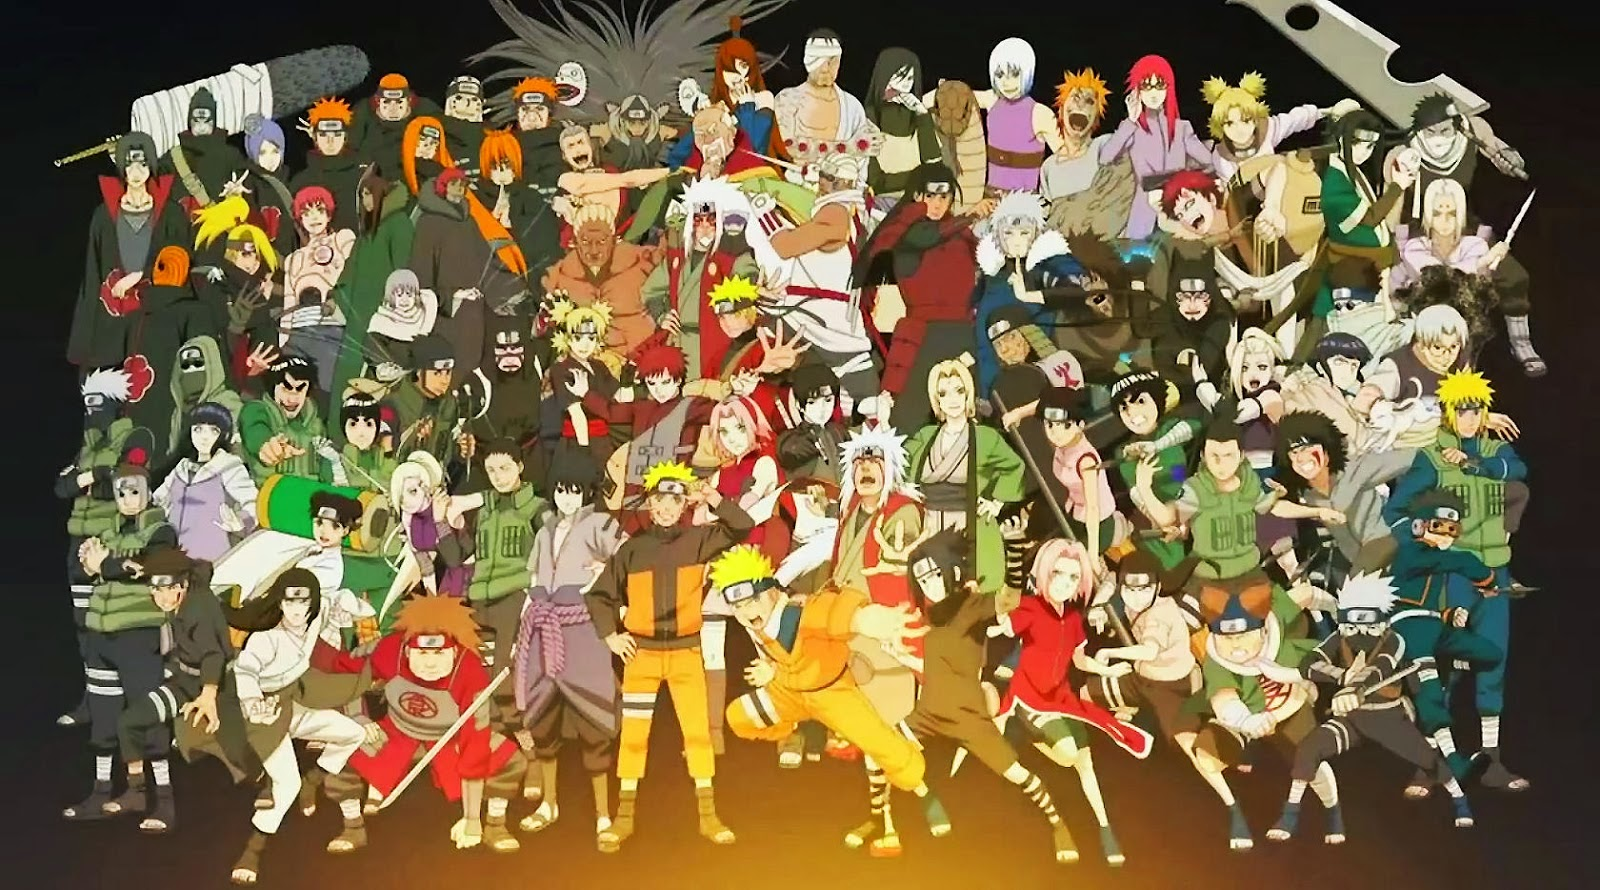 Jadwal Rilis Anime Naruto Shippuden Juli 2015